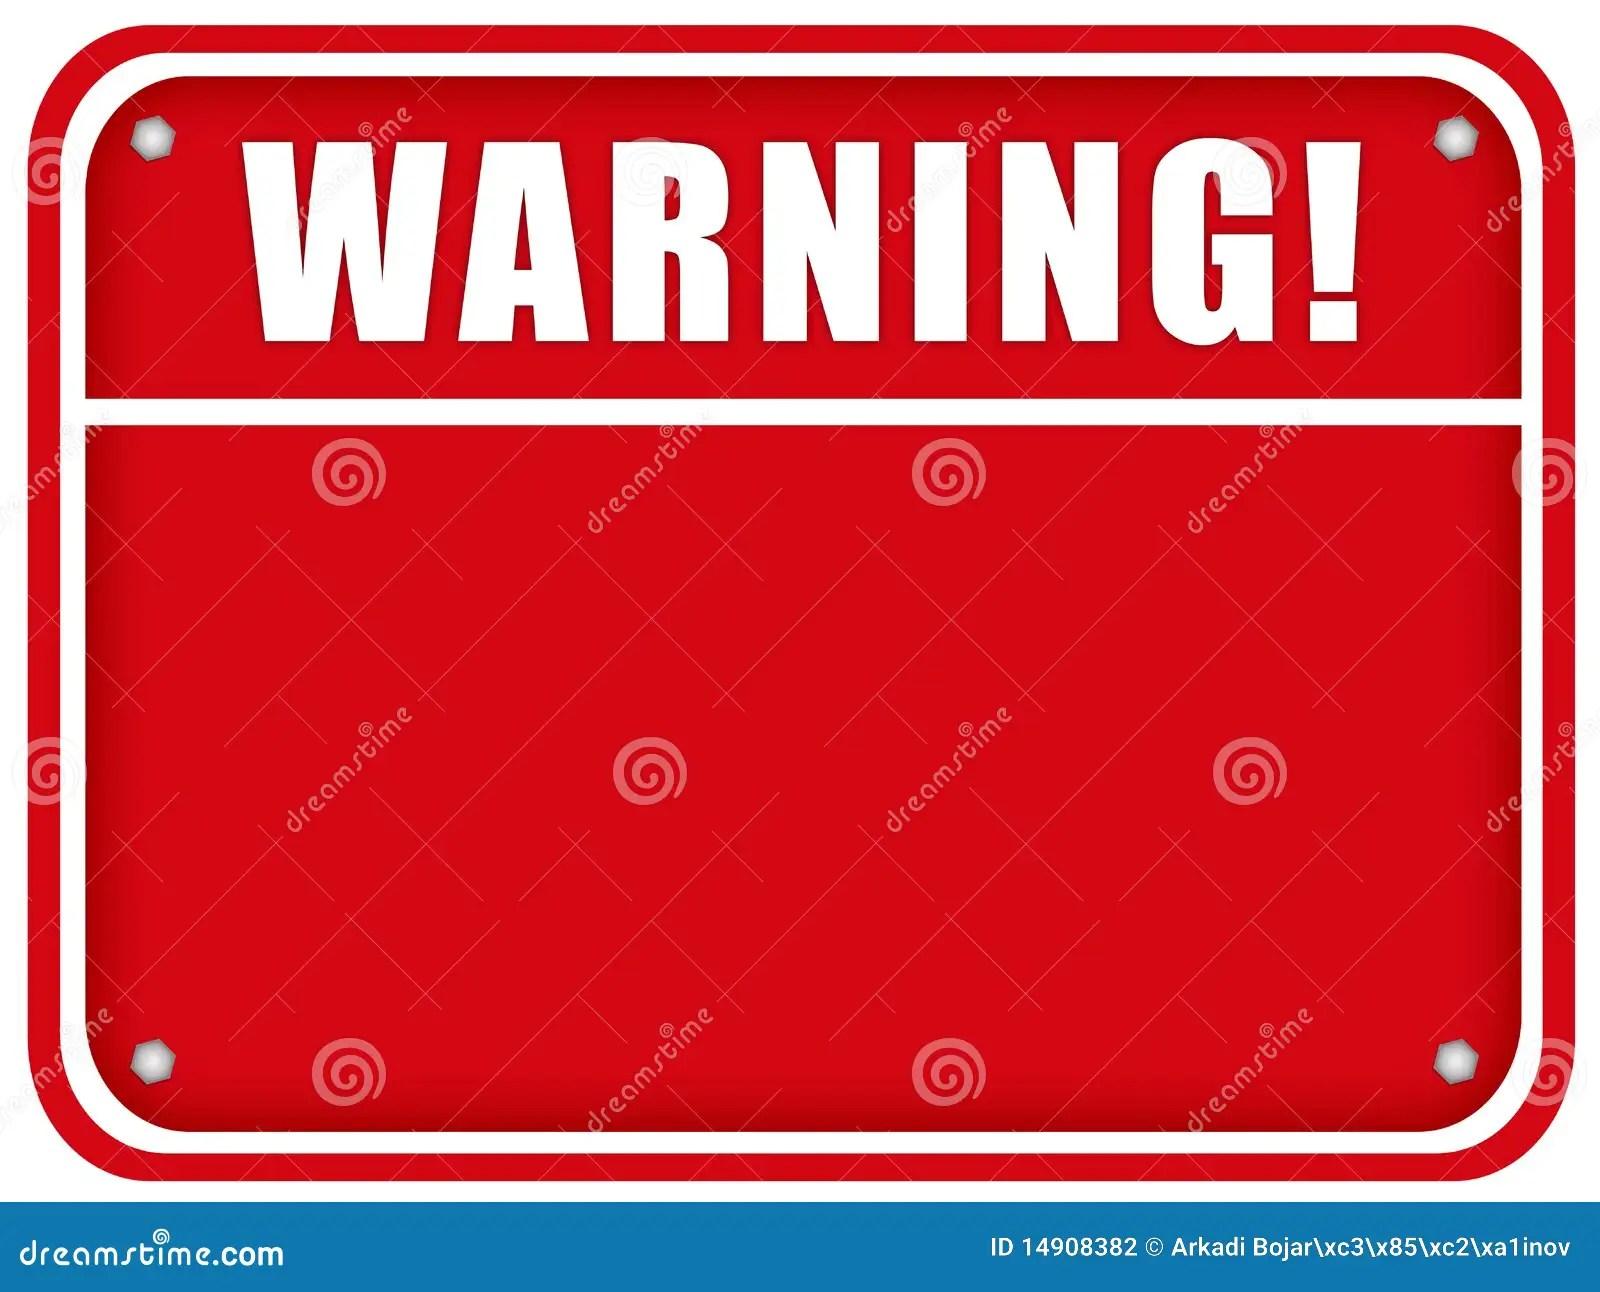 Printable Blank Warning Signs